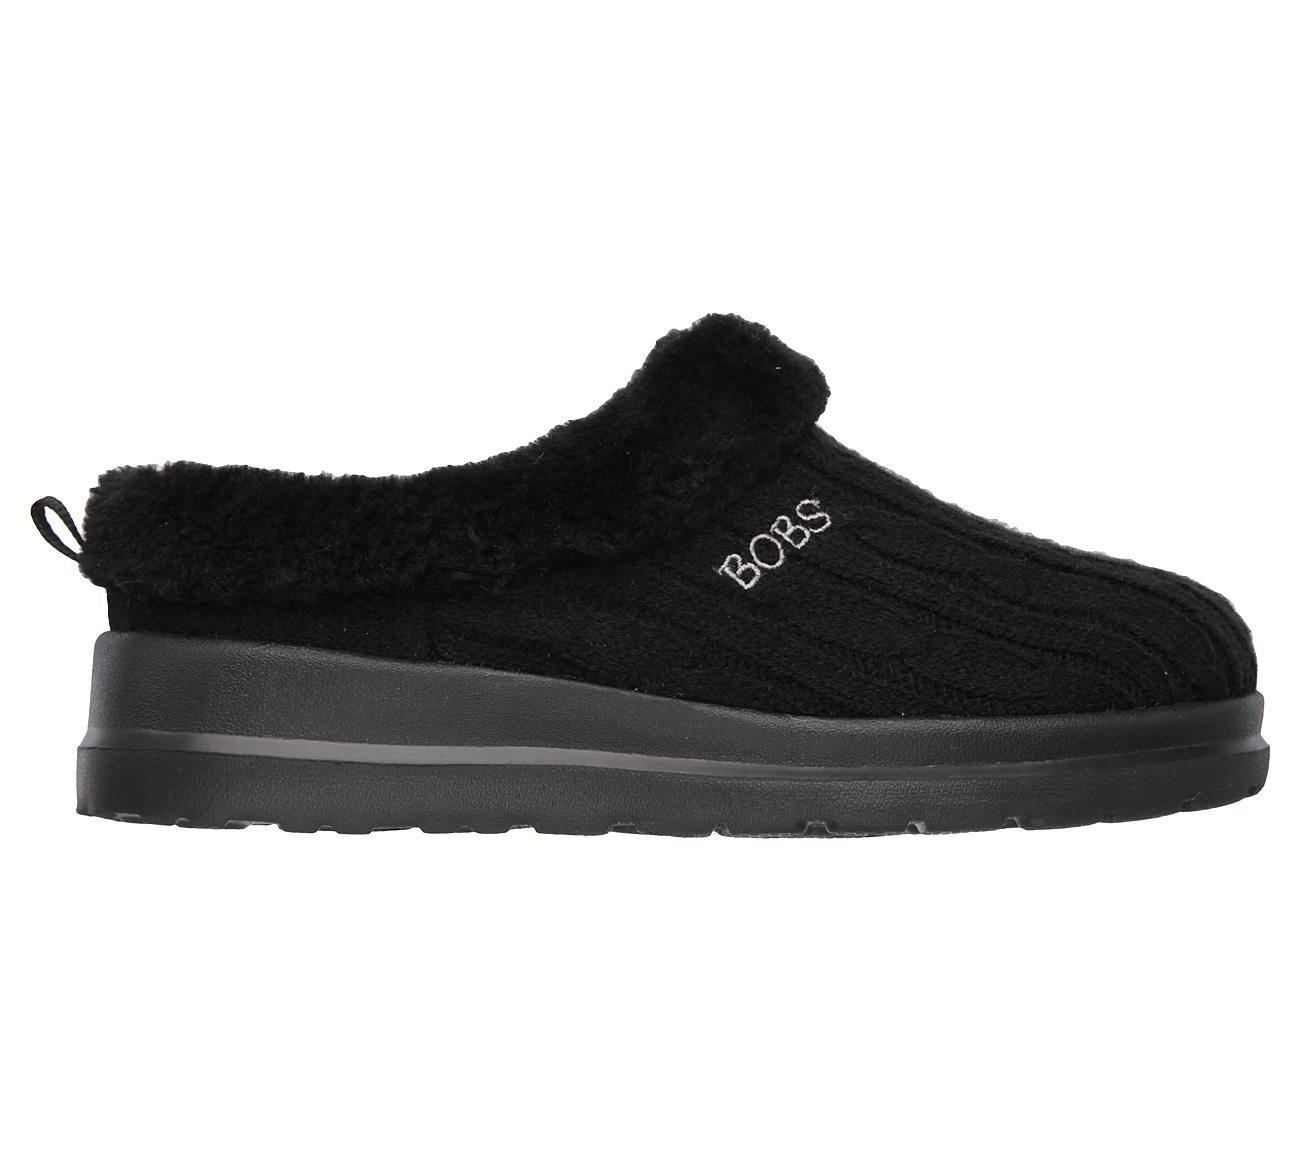 Buy SKECHERS Bobs Cherish Wonder Fall Bobs Shoes Ul5L1